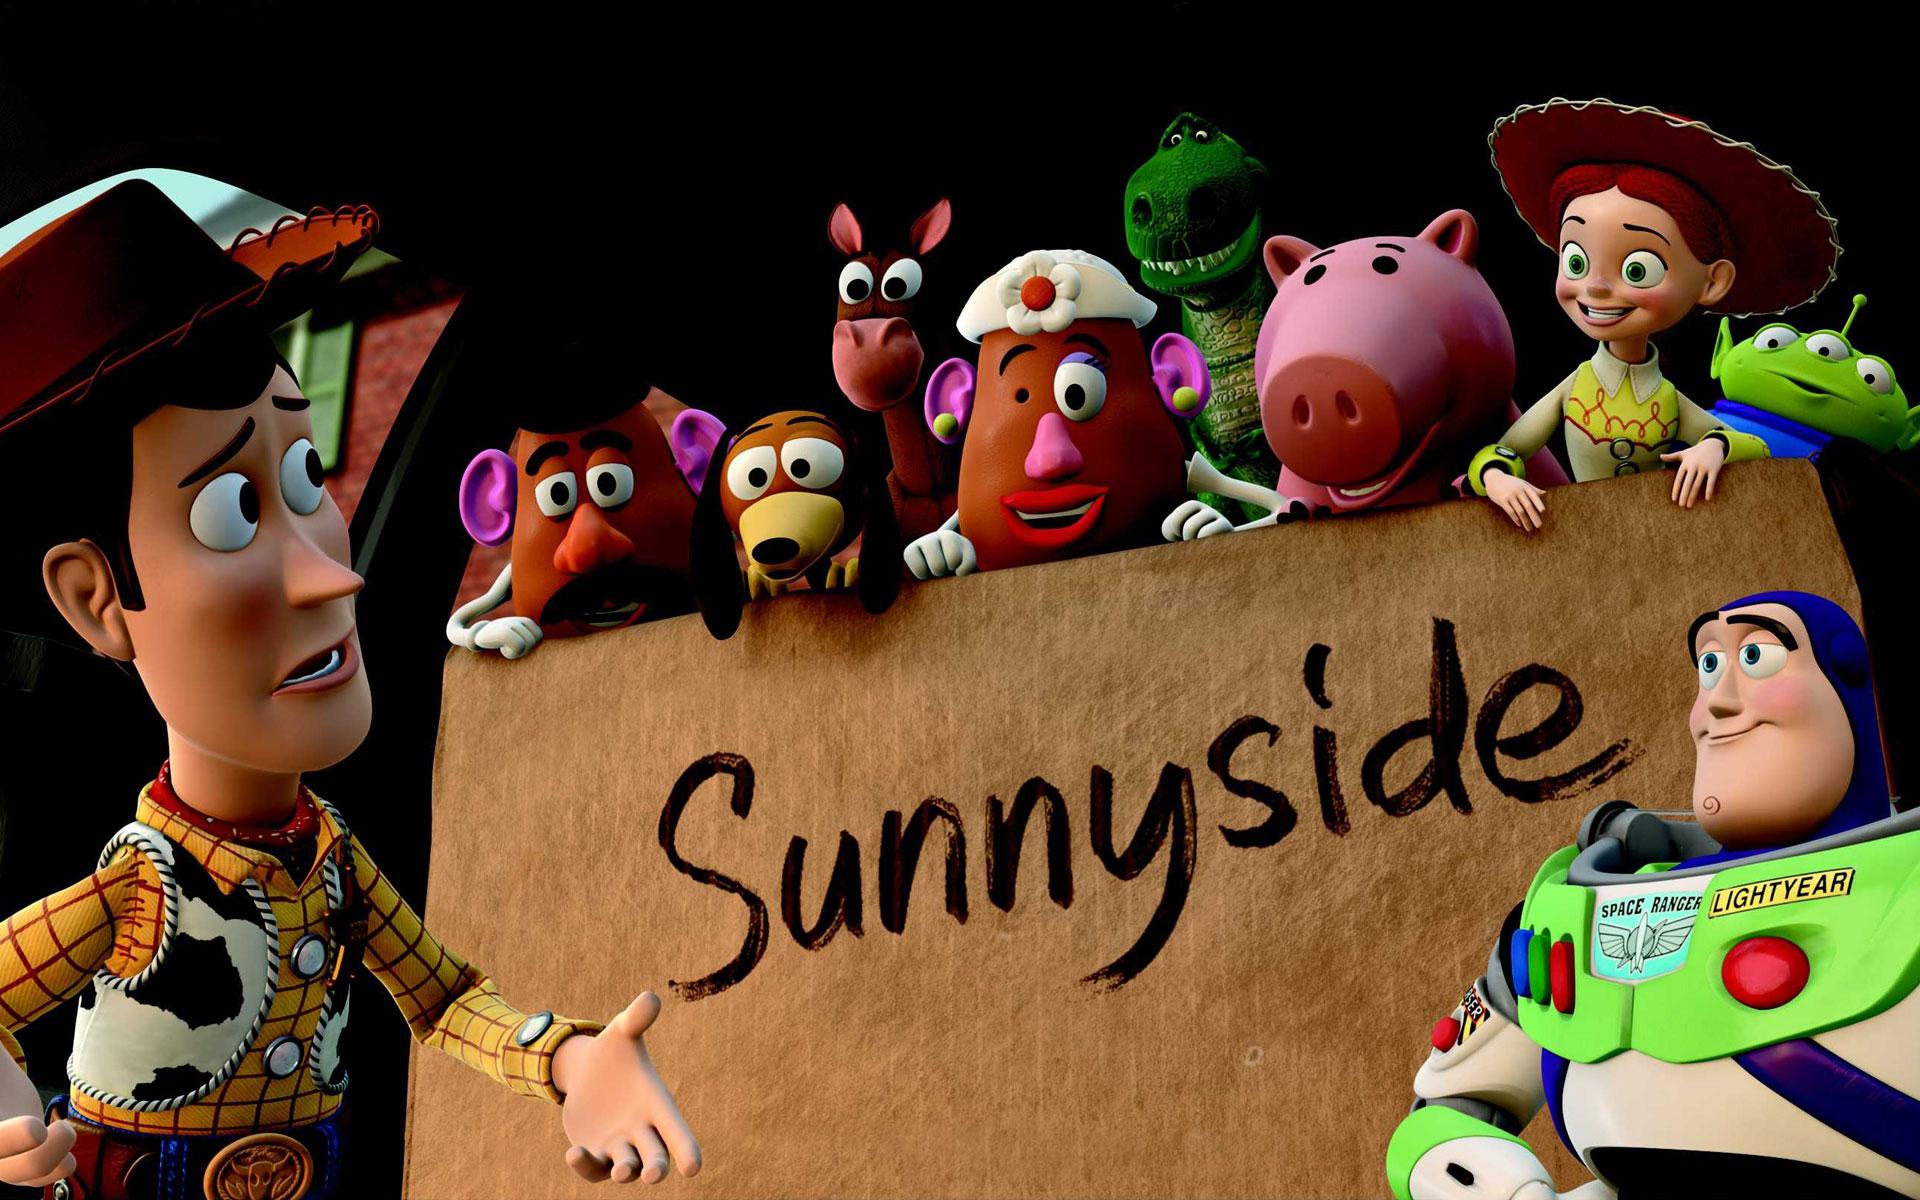 Sunny Side Toy Story Family - Sunny Side Toy Story Family